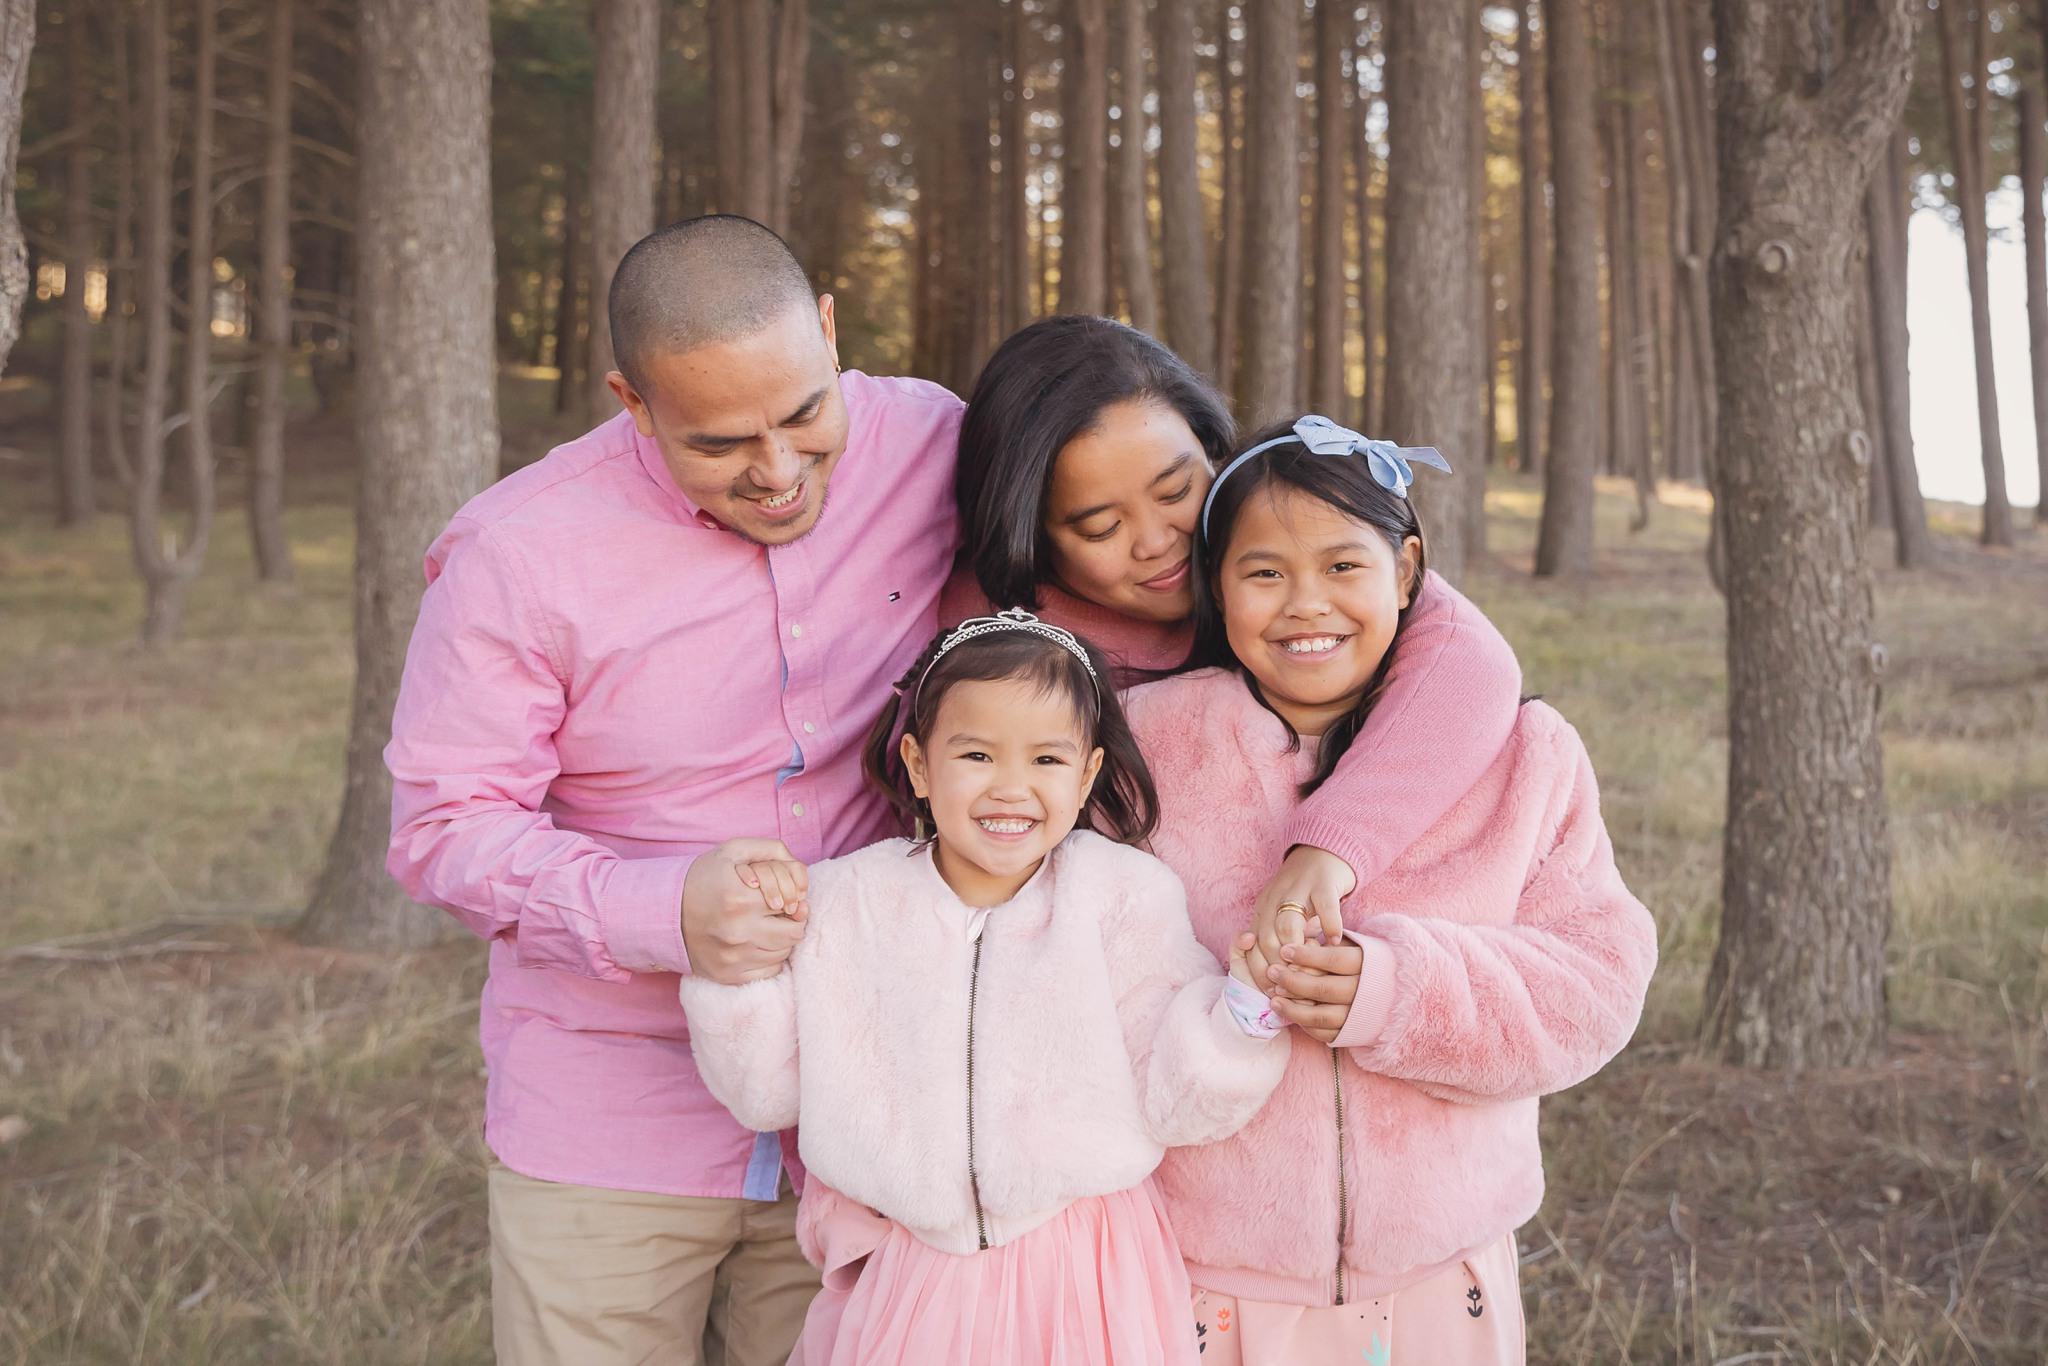 Canberra Family Professional Photographer Newborn Children Maternity Portrait